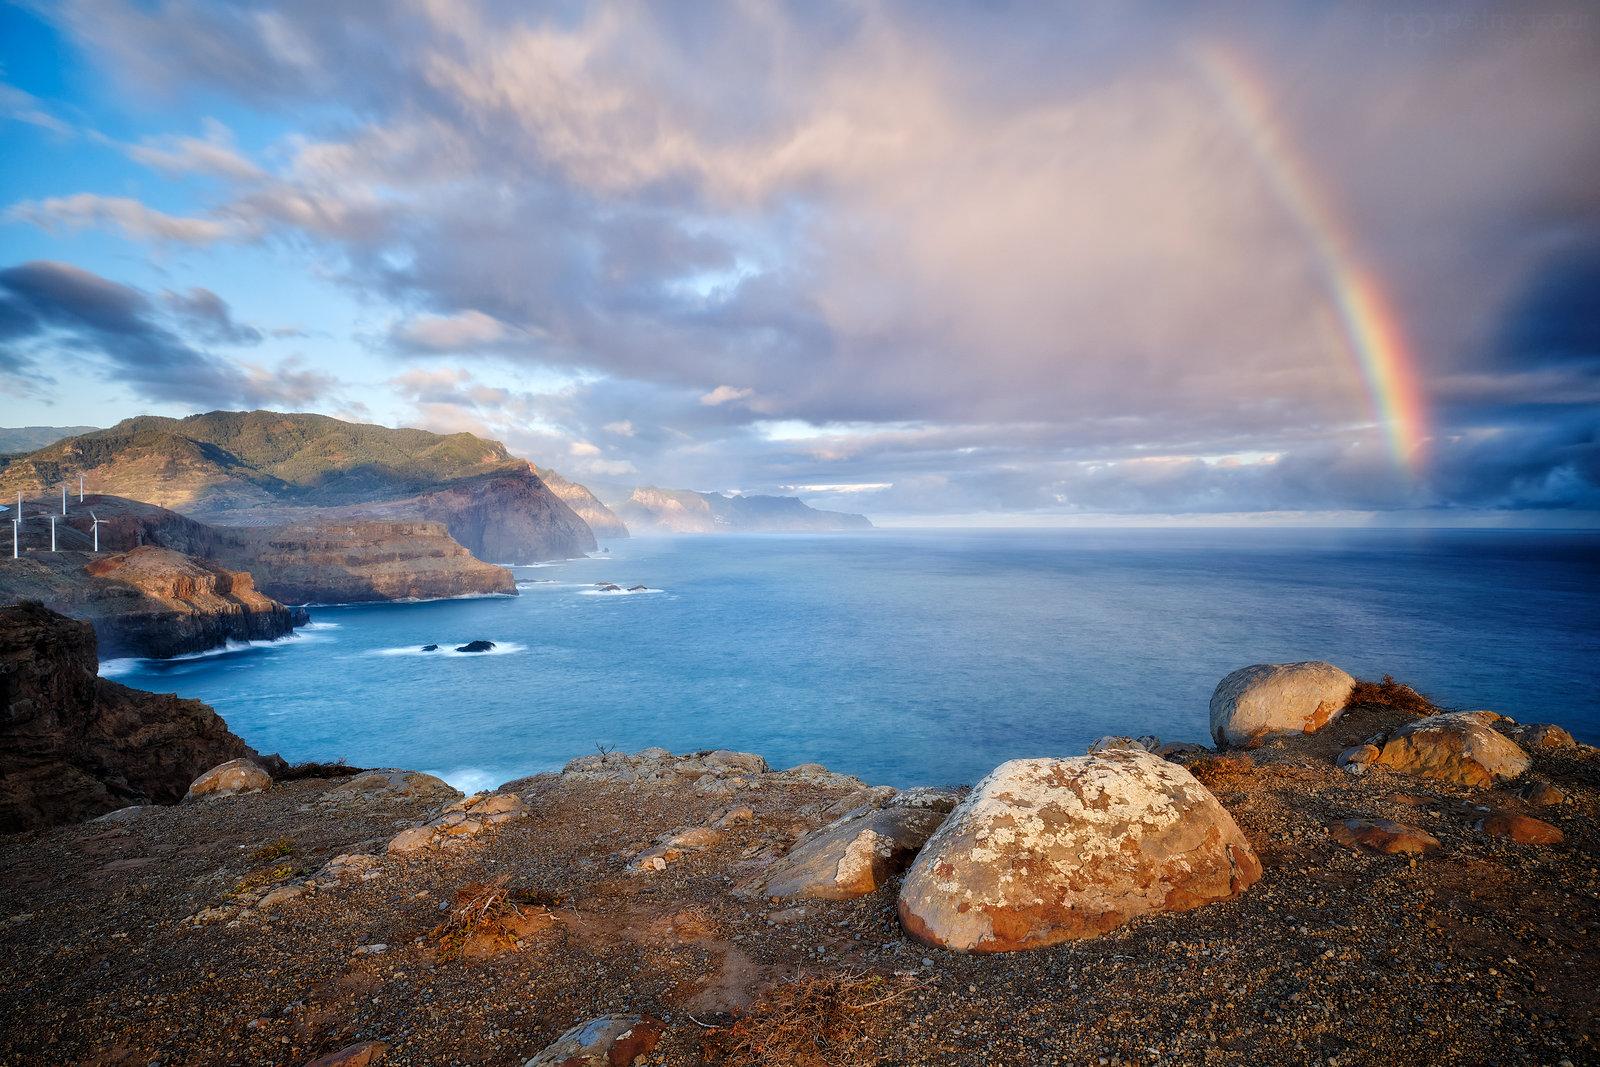 Duha nad Madeirou